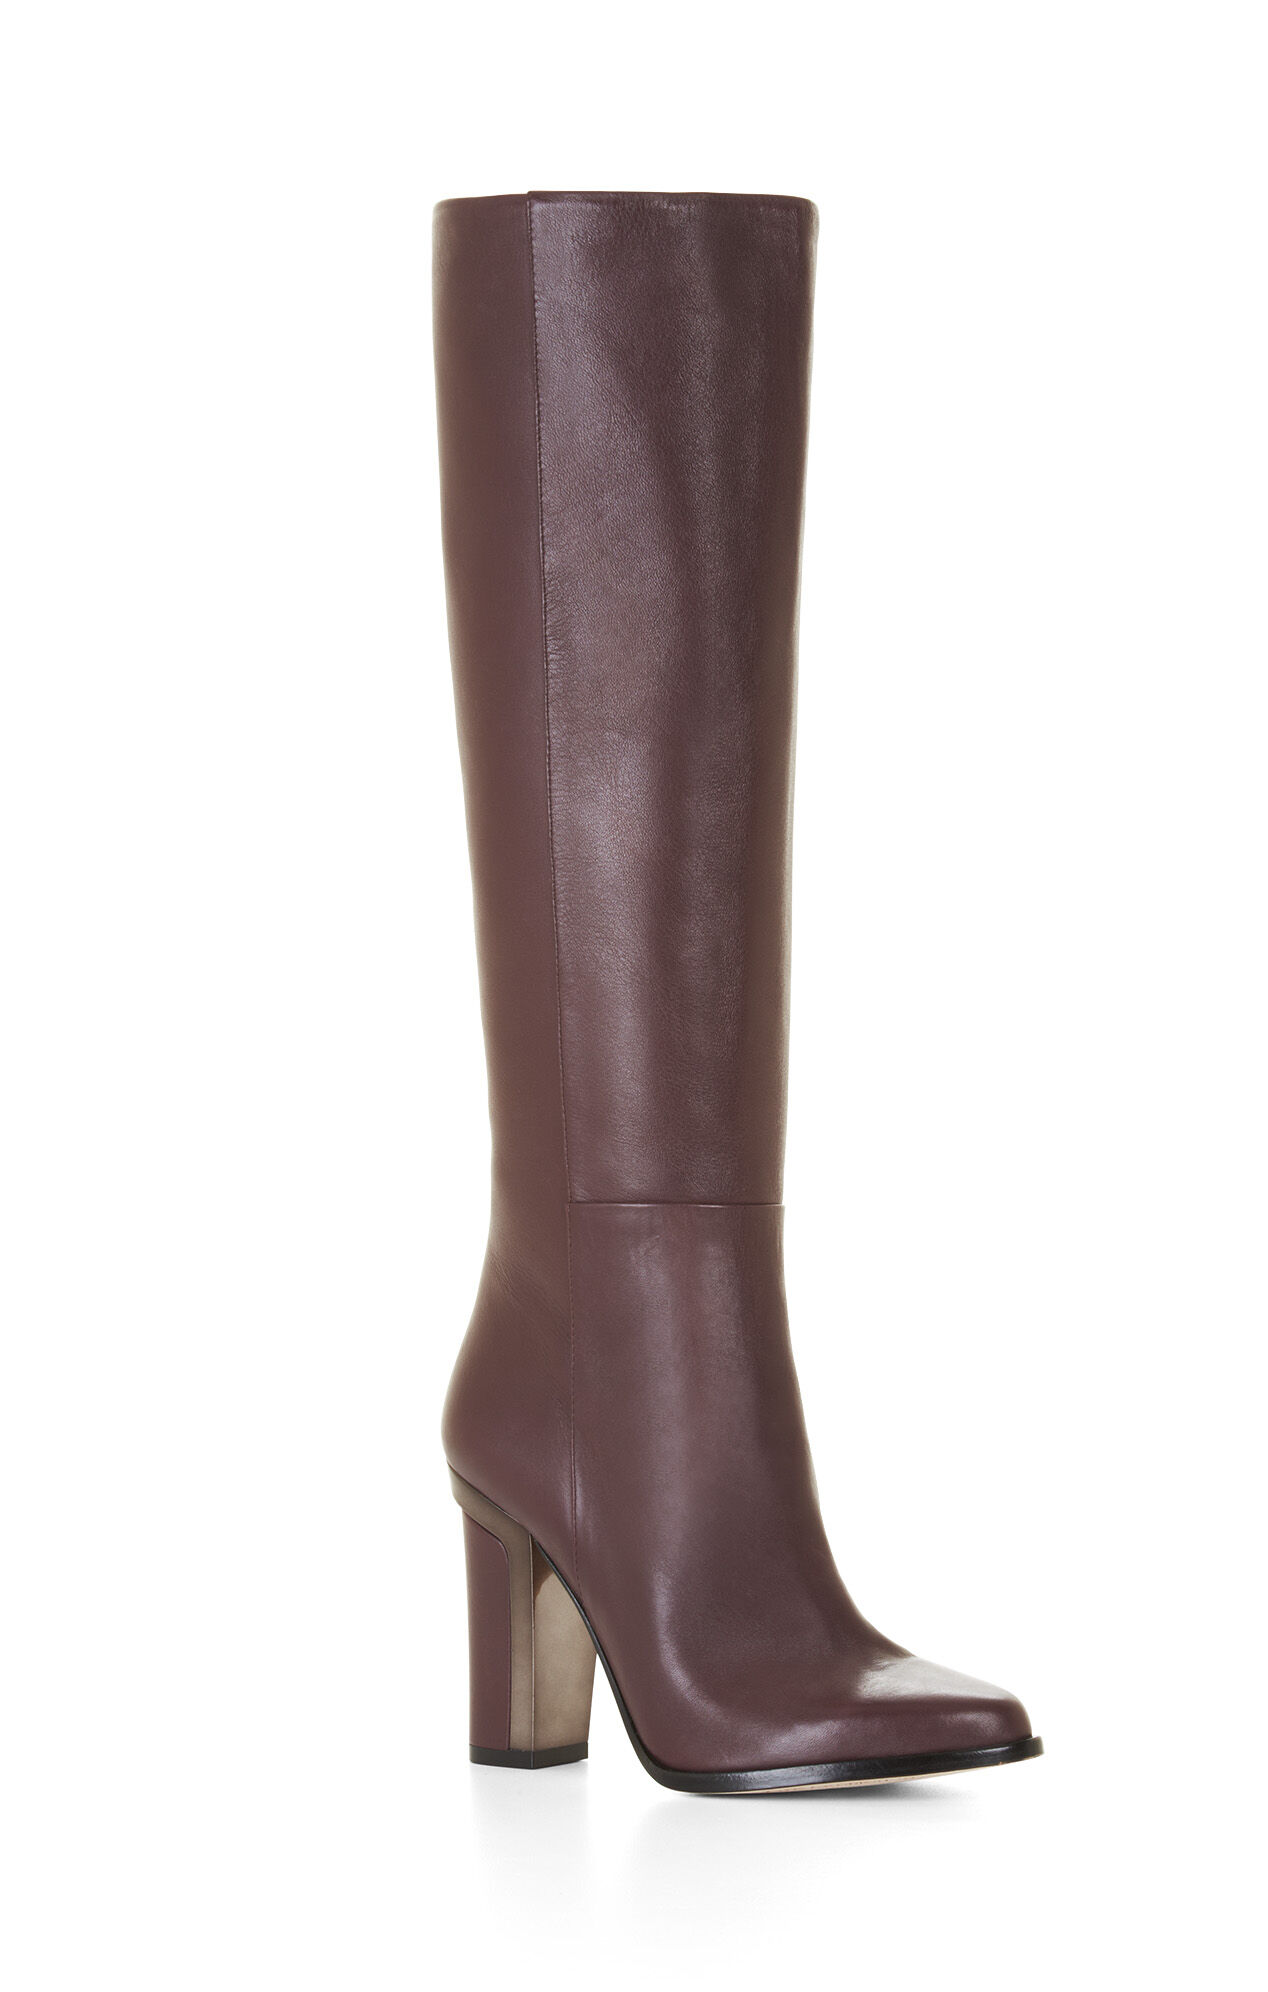 oak high heel leather knee boots